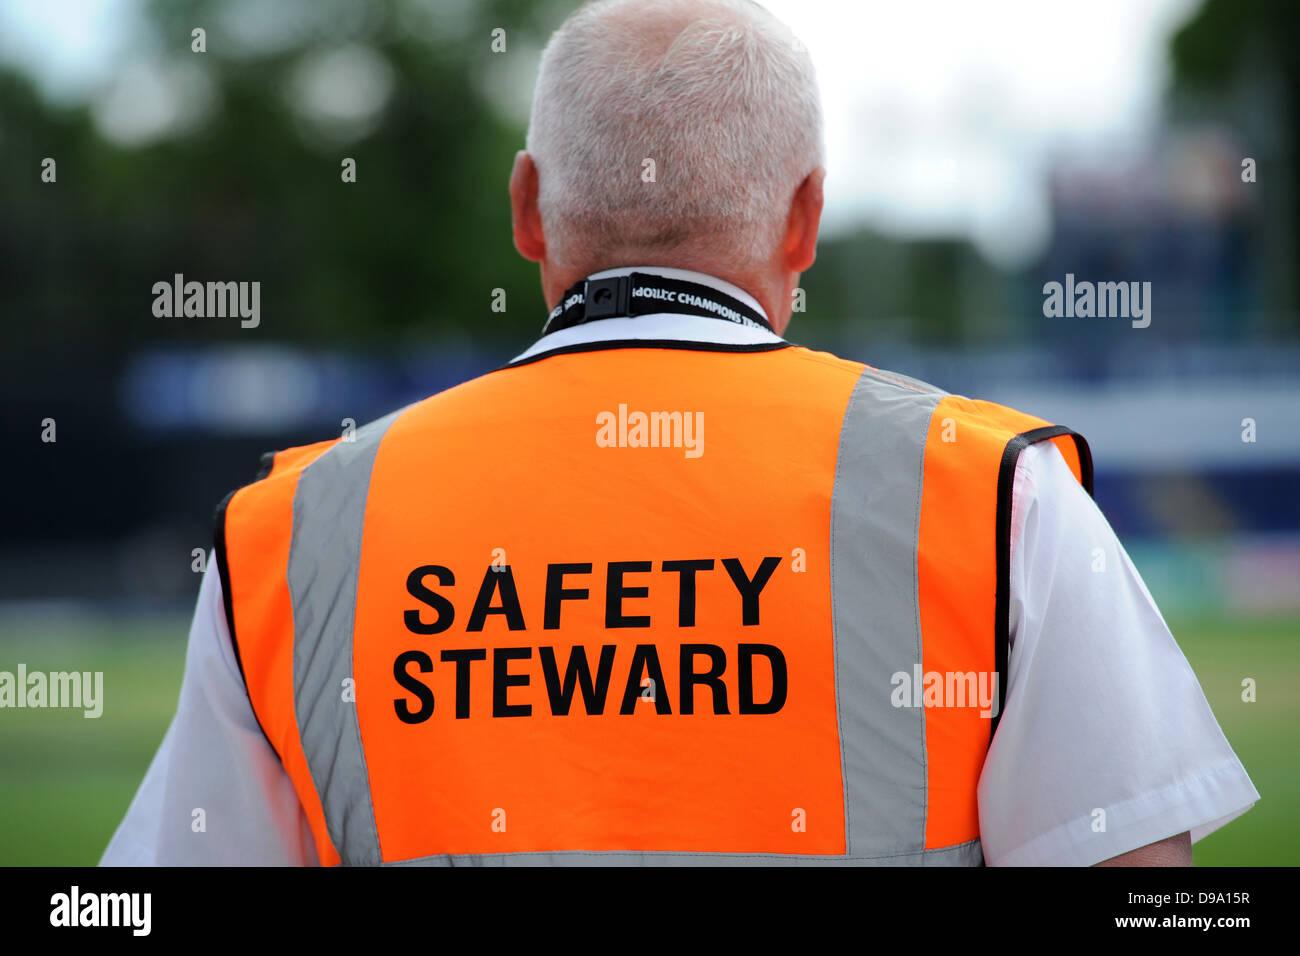 Image result for Safety Steward